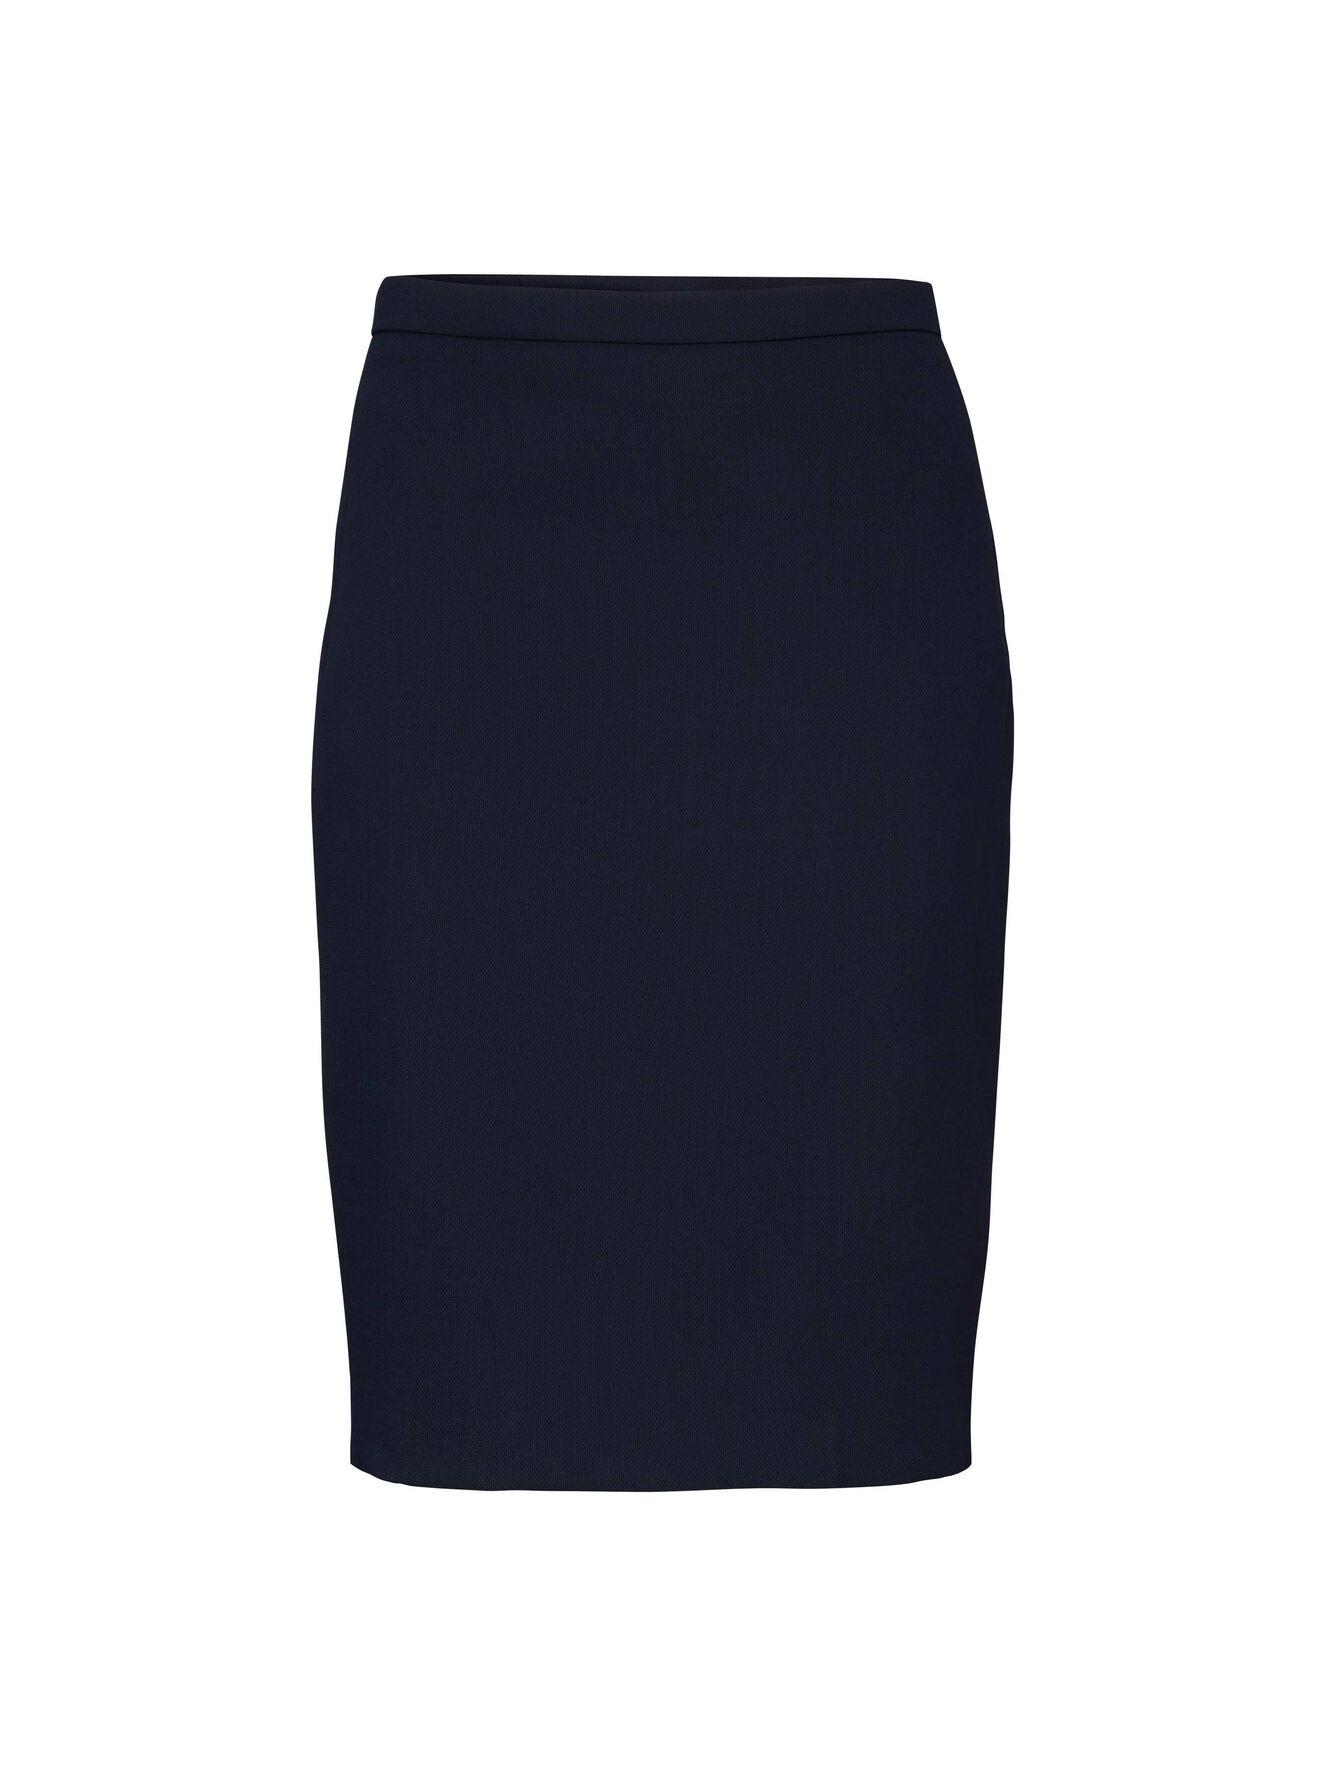 Braya skirt in Peacoat Blue from Tiger of Sweden